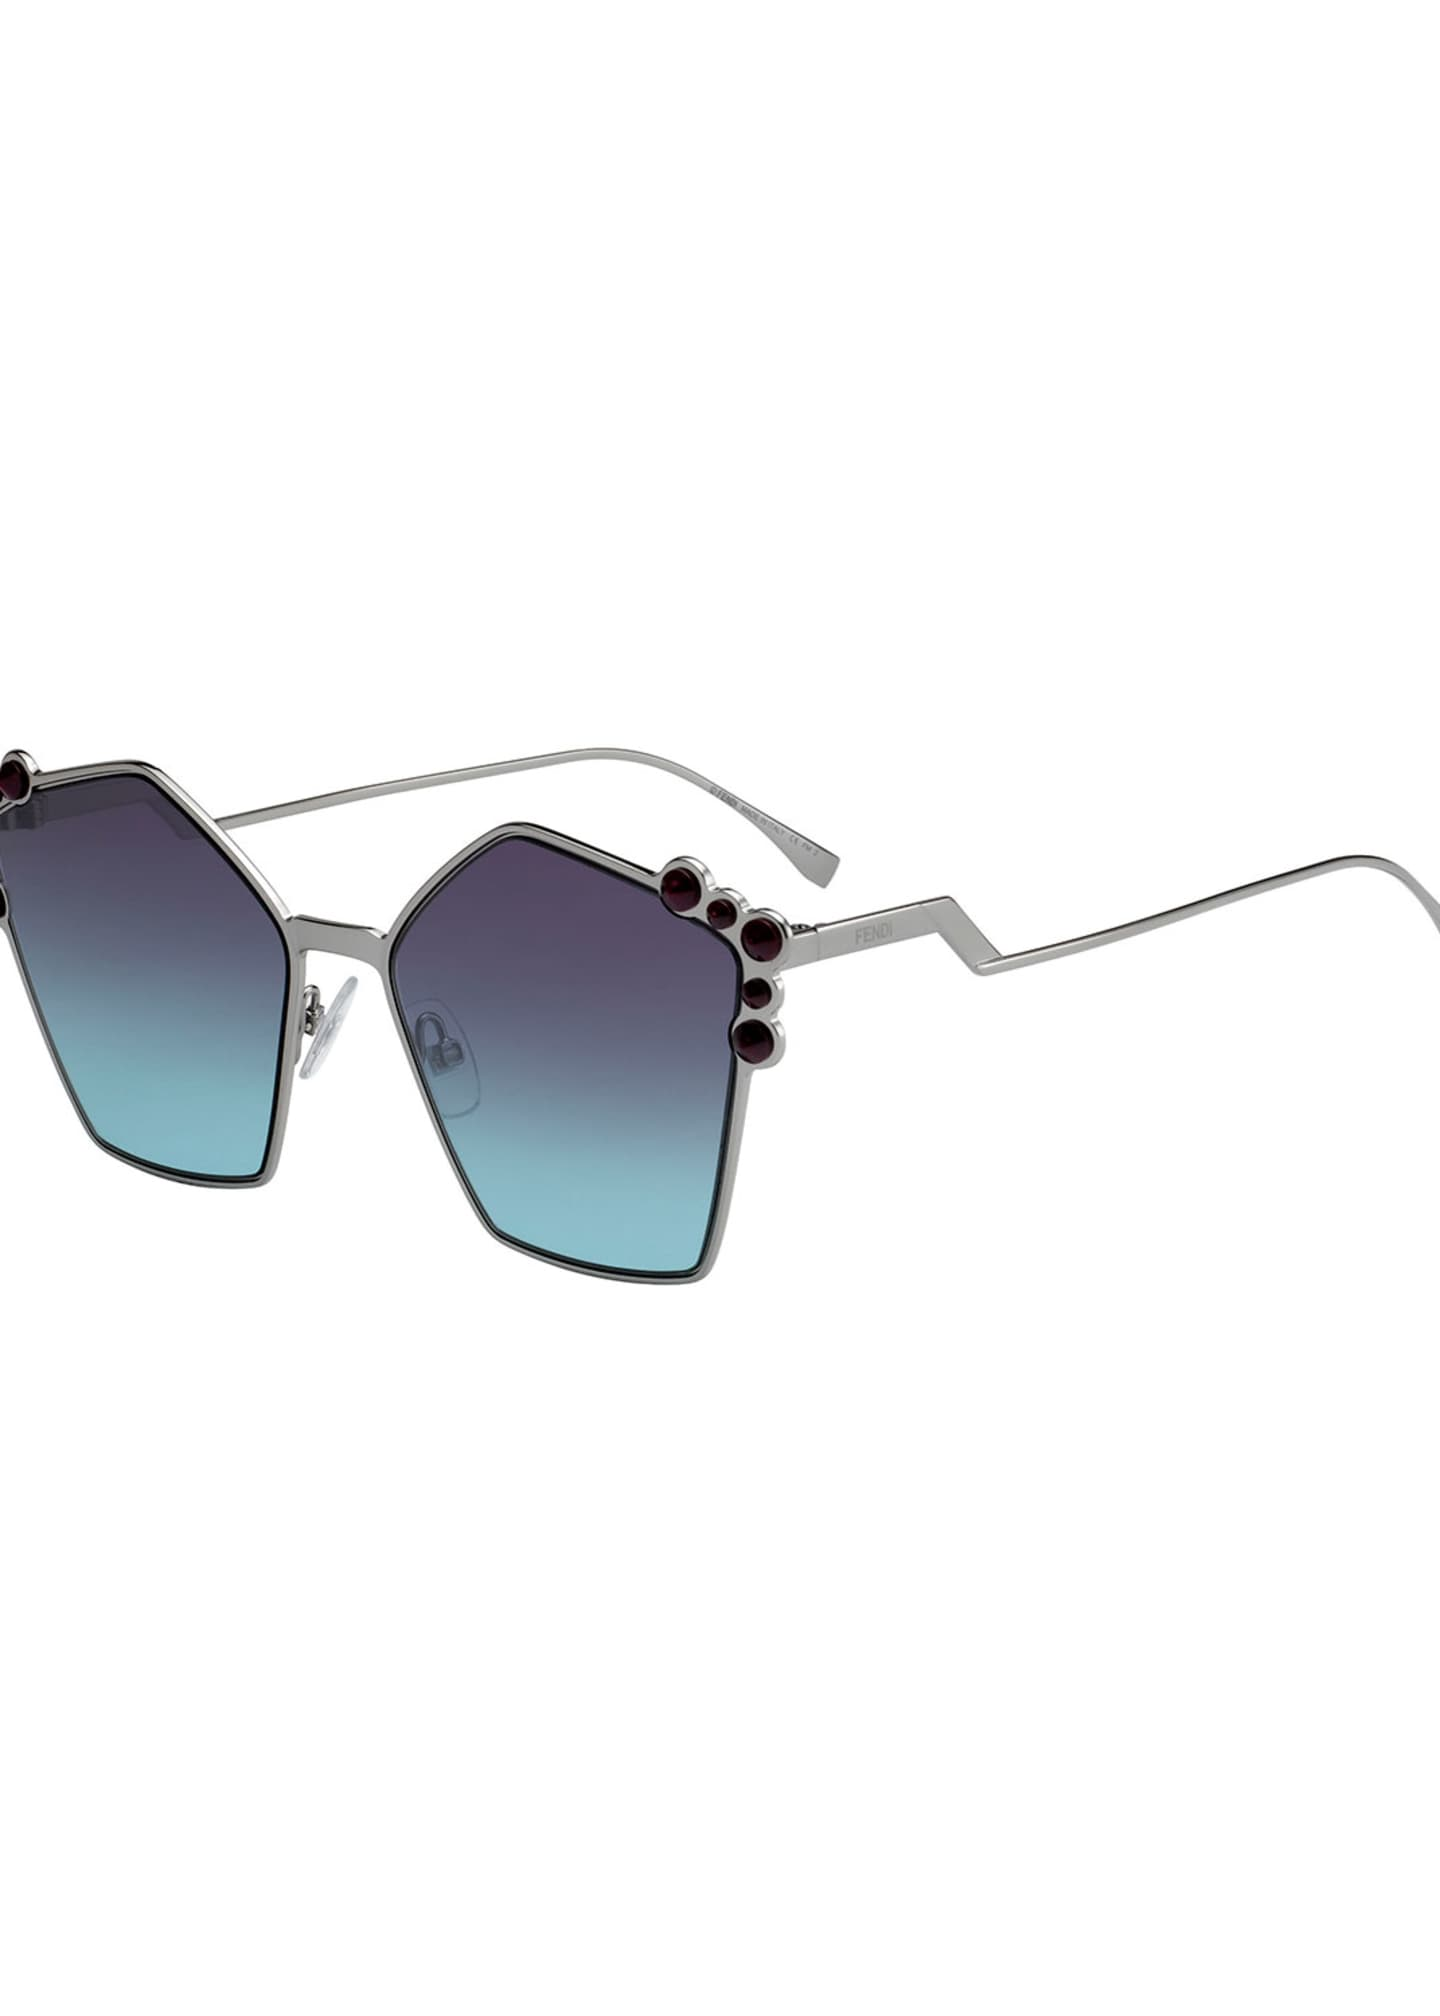 Fendi Studded Oversized Geometric Sunglasses